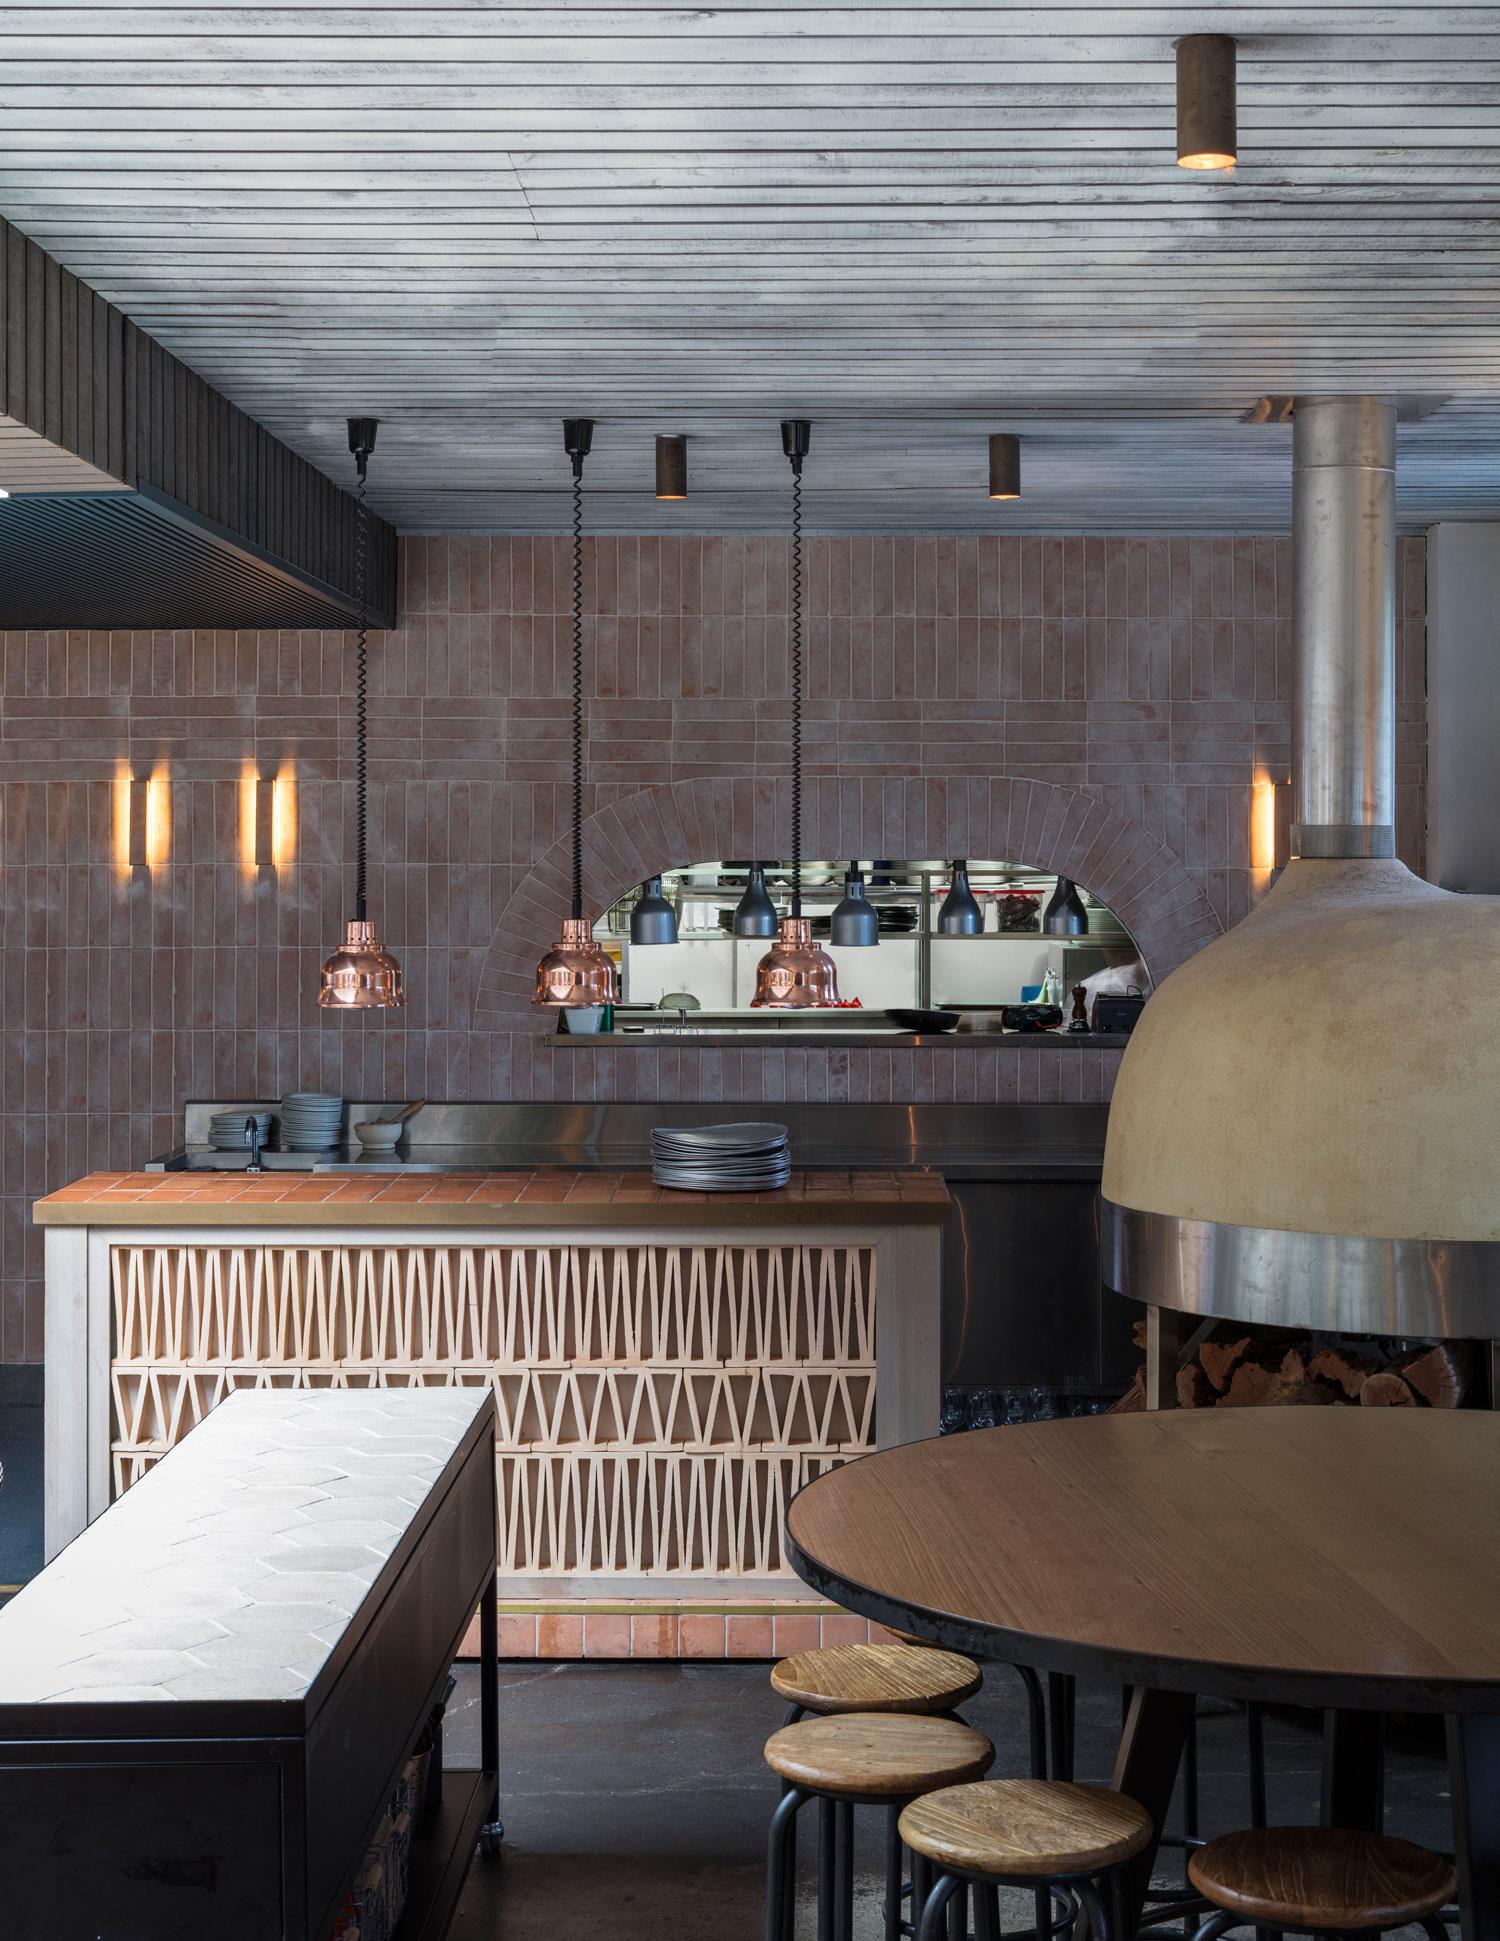 Yellowtrace Spotlight Australian Design News March 2014: Buena Vista Hotel In Mosman By SJB Interiros & Tess Regan